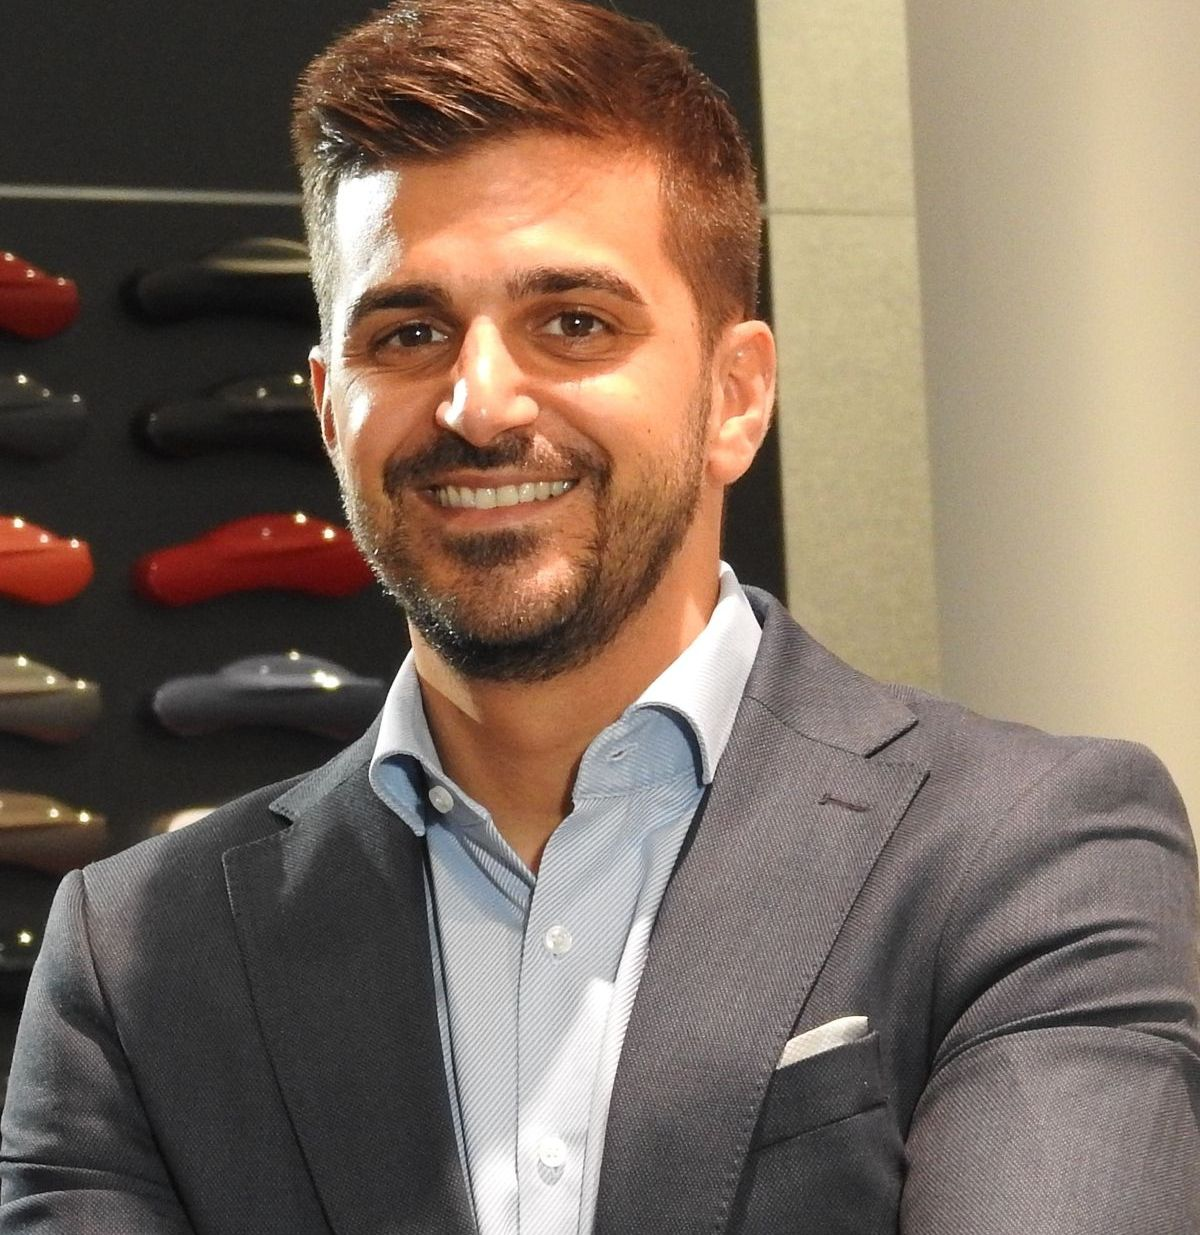 Fabio Sangermano